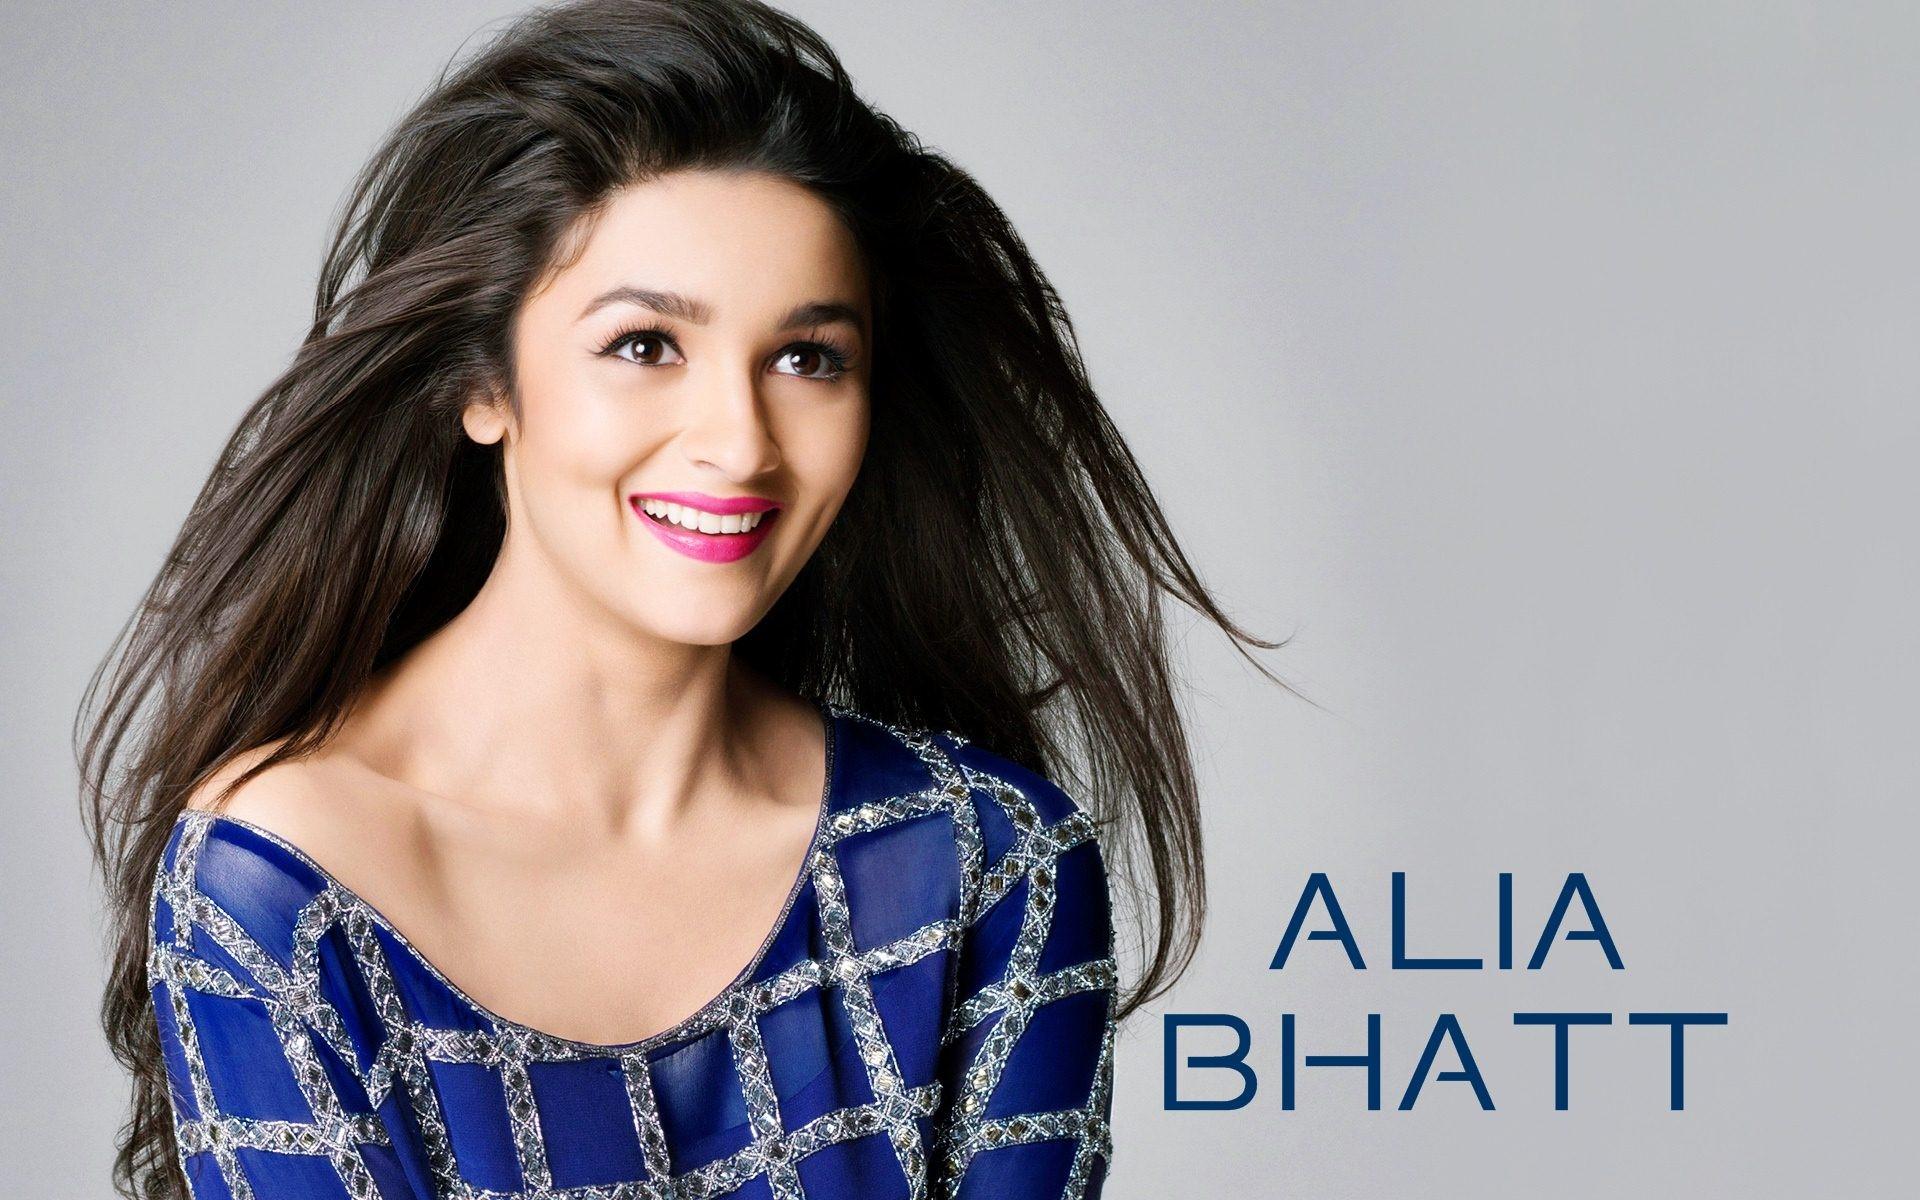 Alia Bhatt Image 25 Most Beautiful Collections